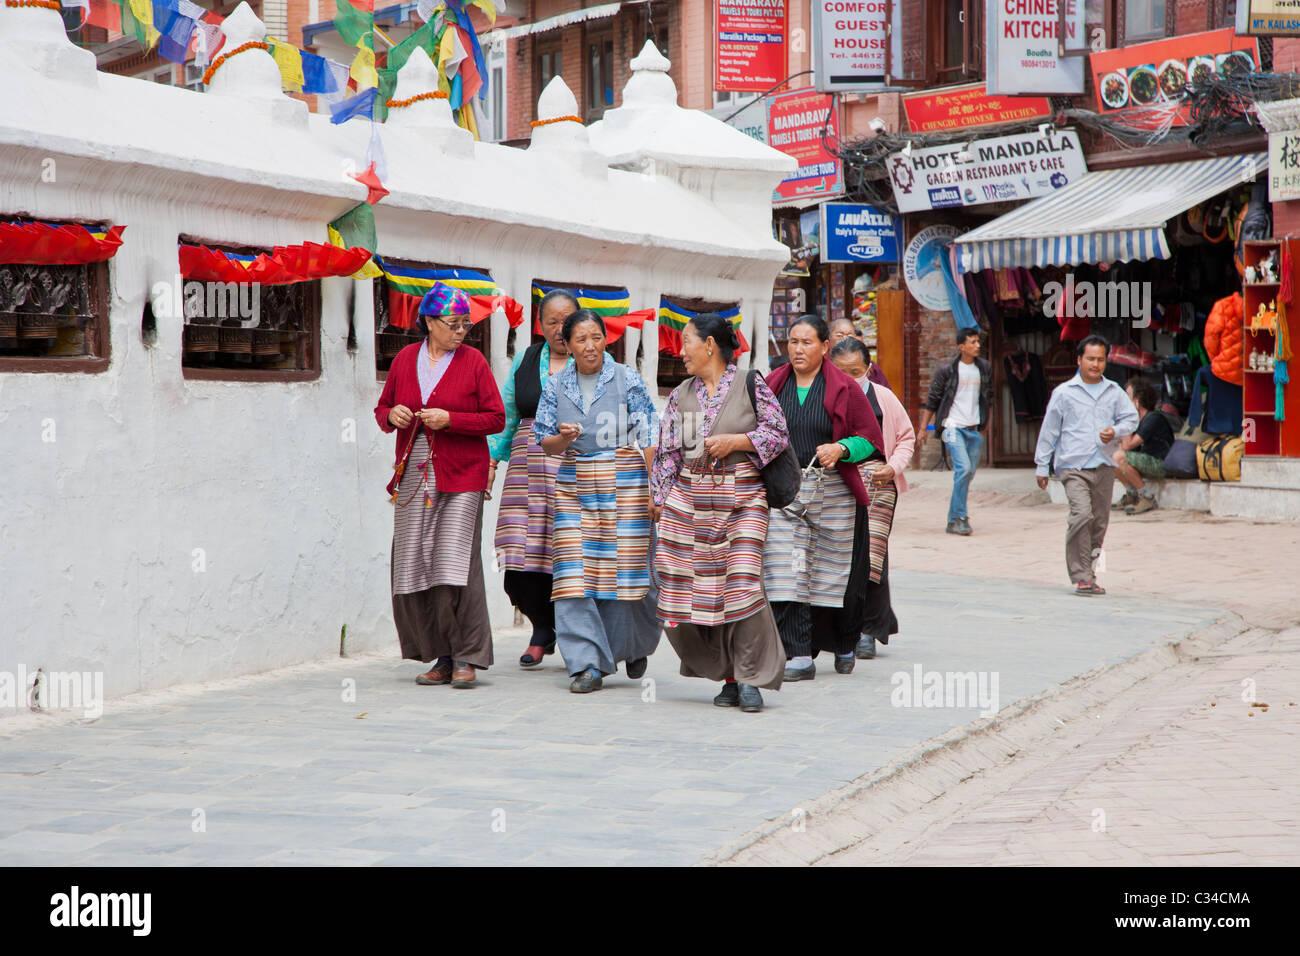 Tibetans at Bouddhanath Stupa - Stock Image